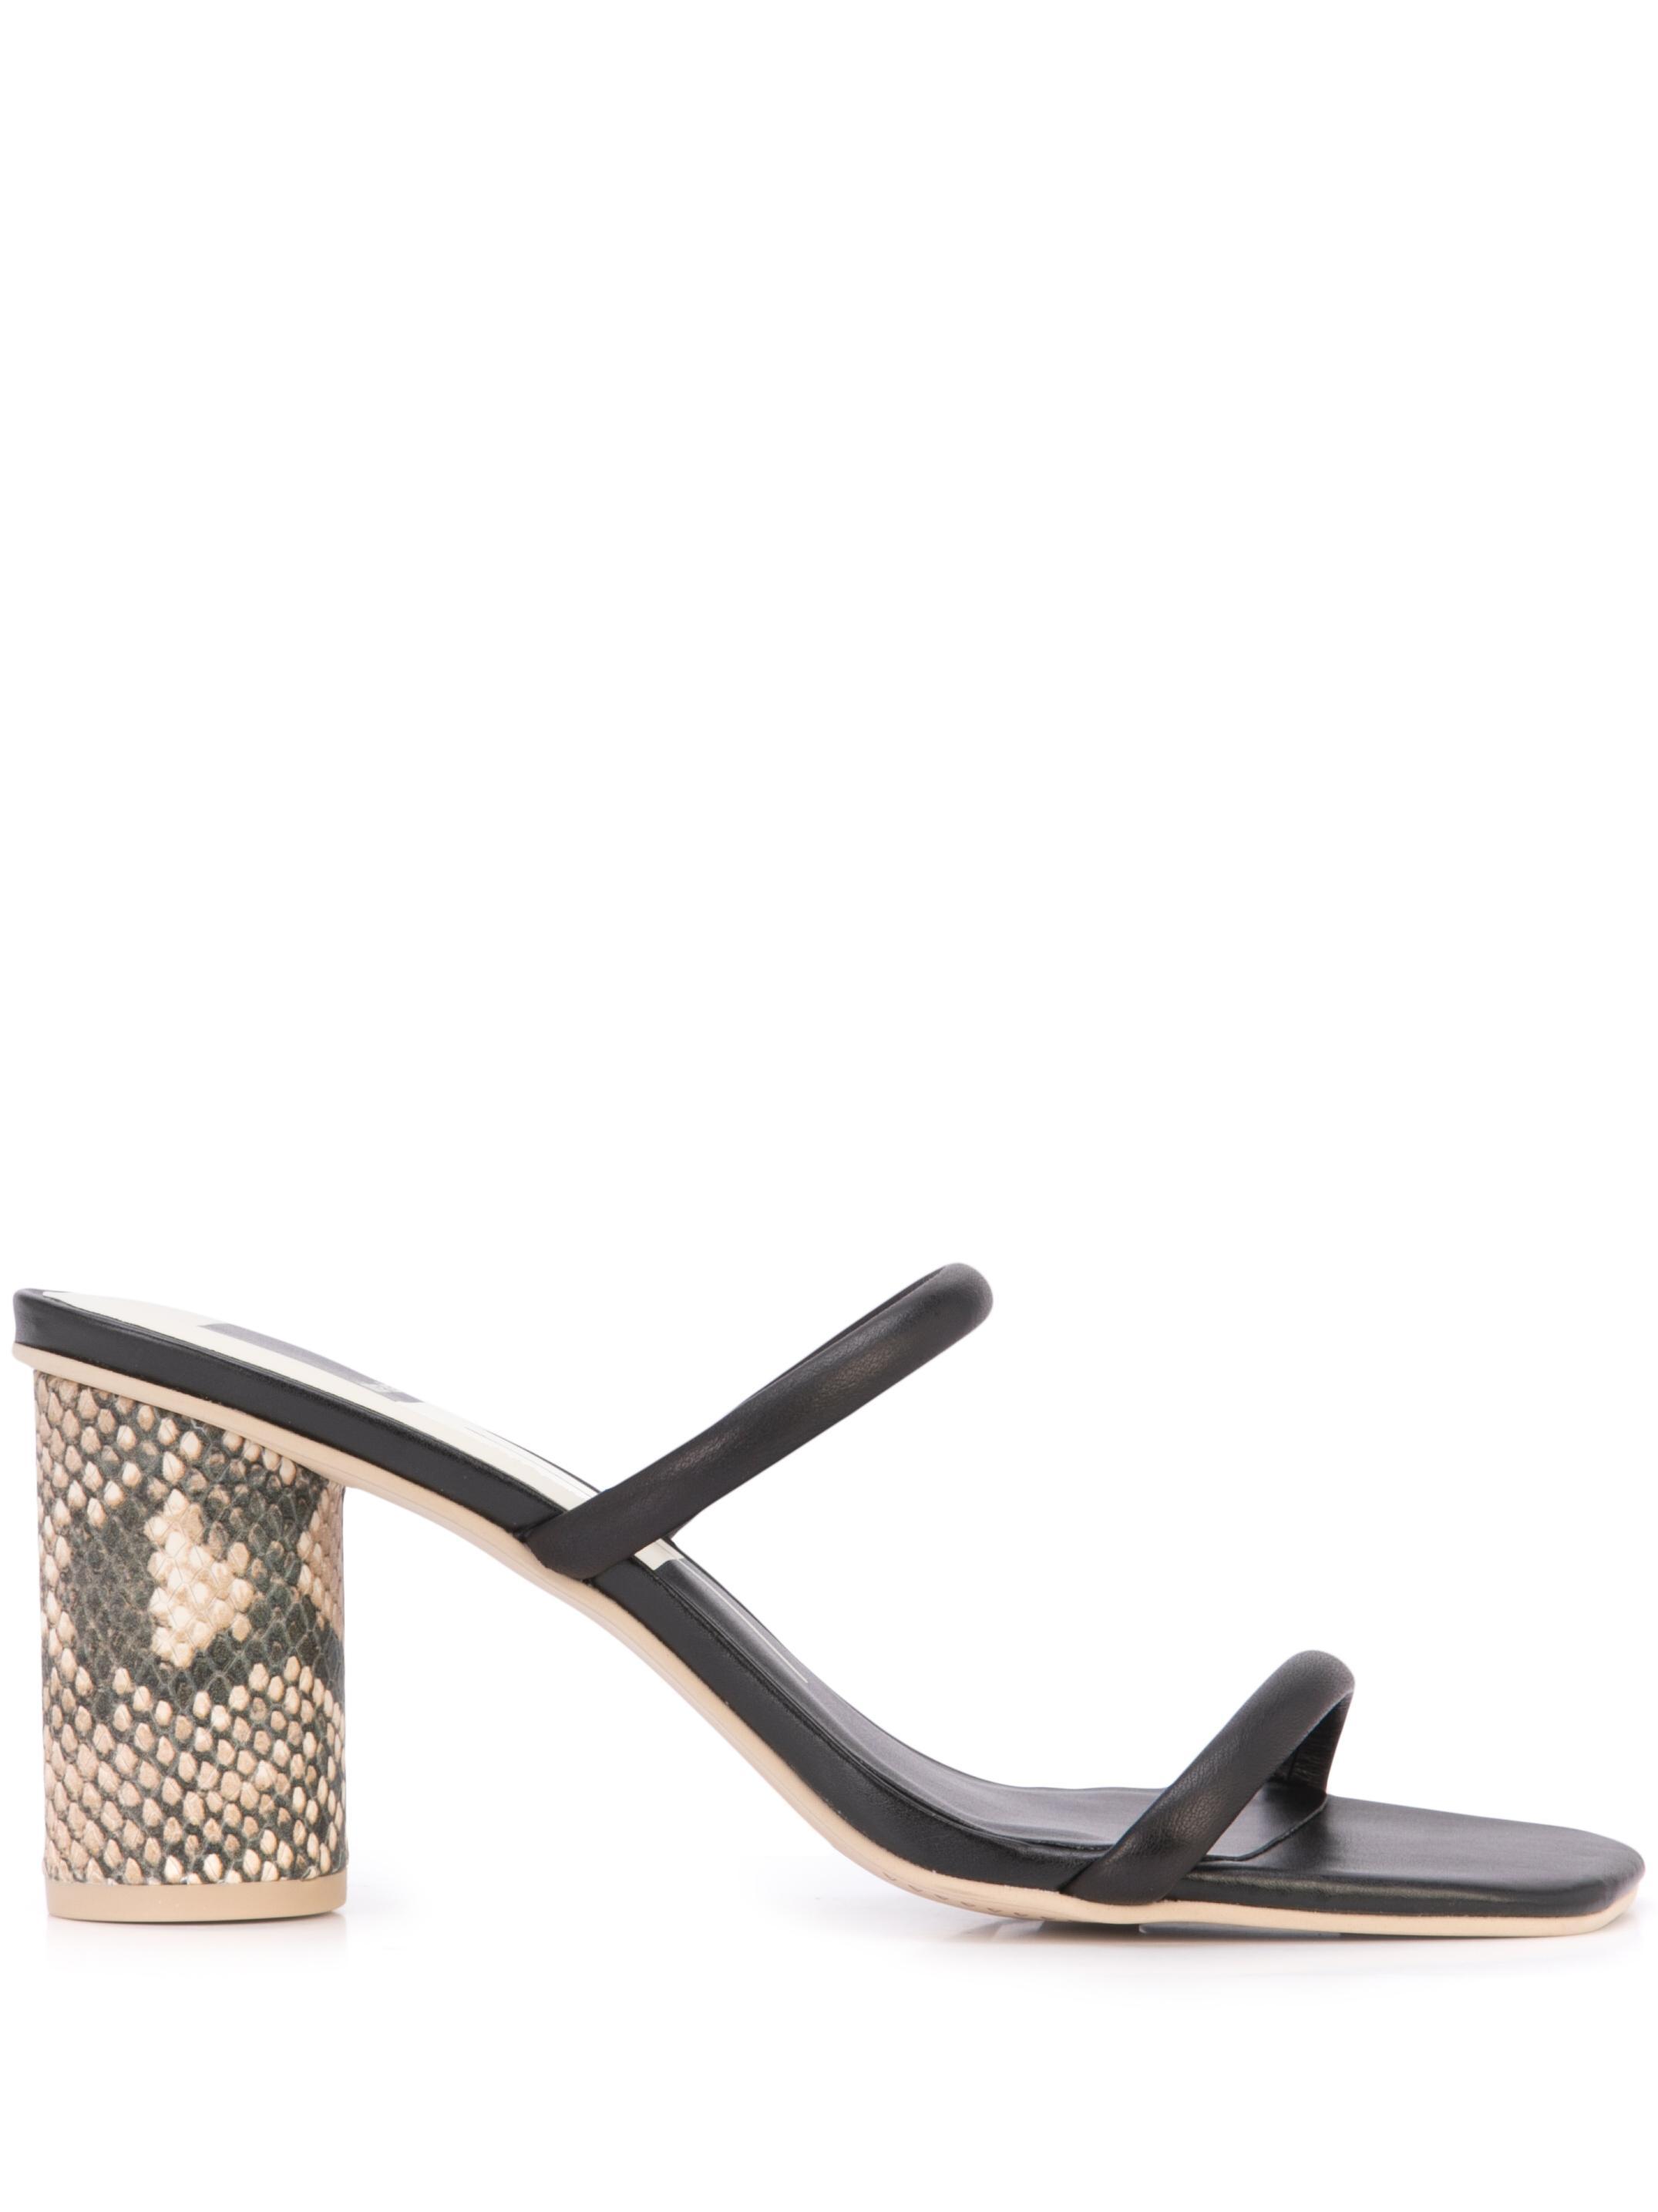 2- Strap Block Heel Leather Sandal Item # NOLES